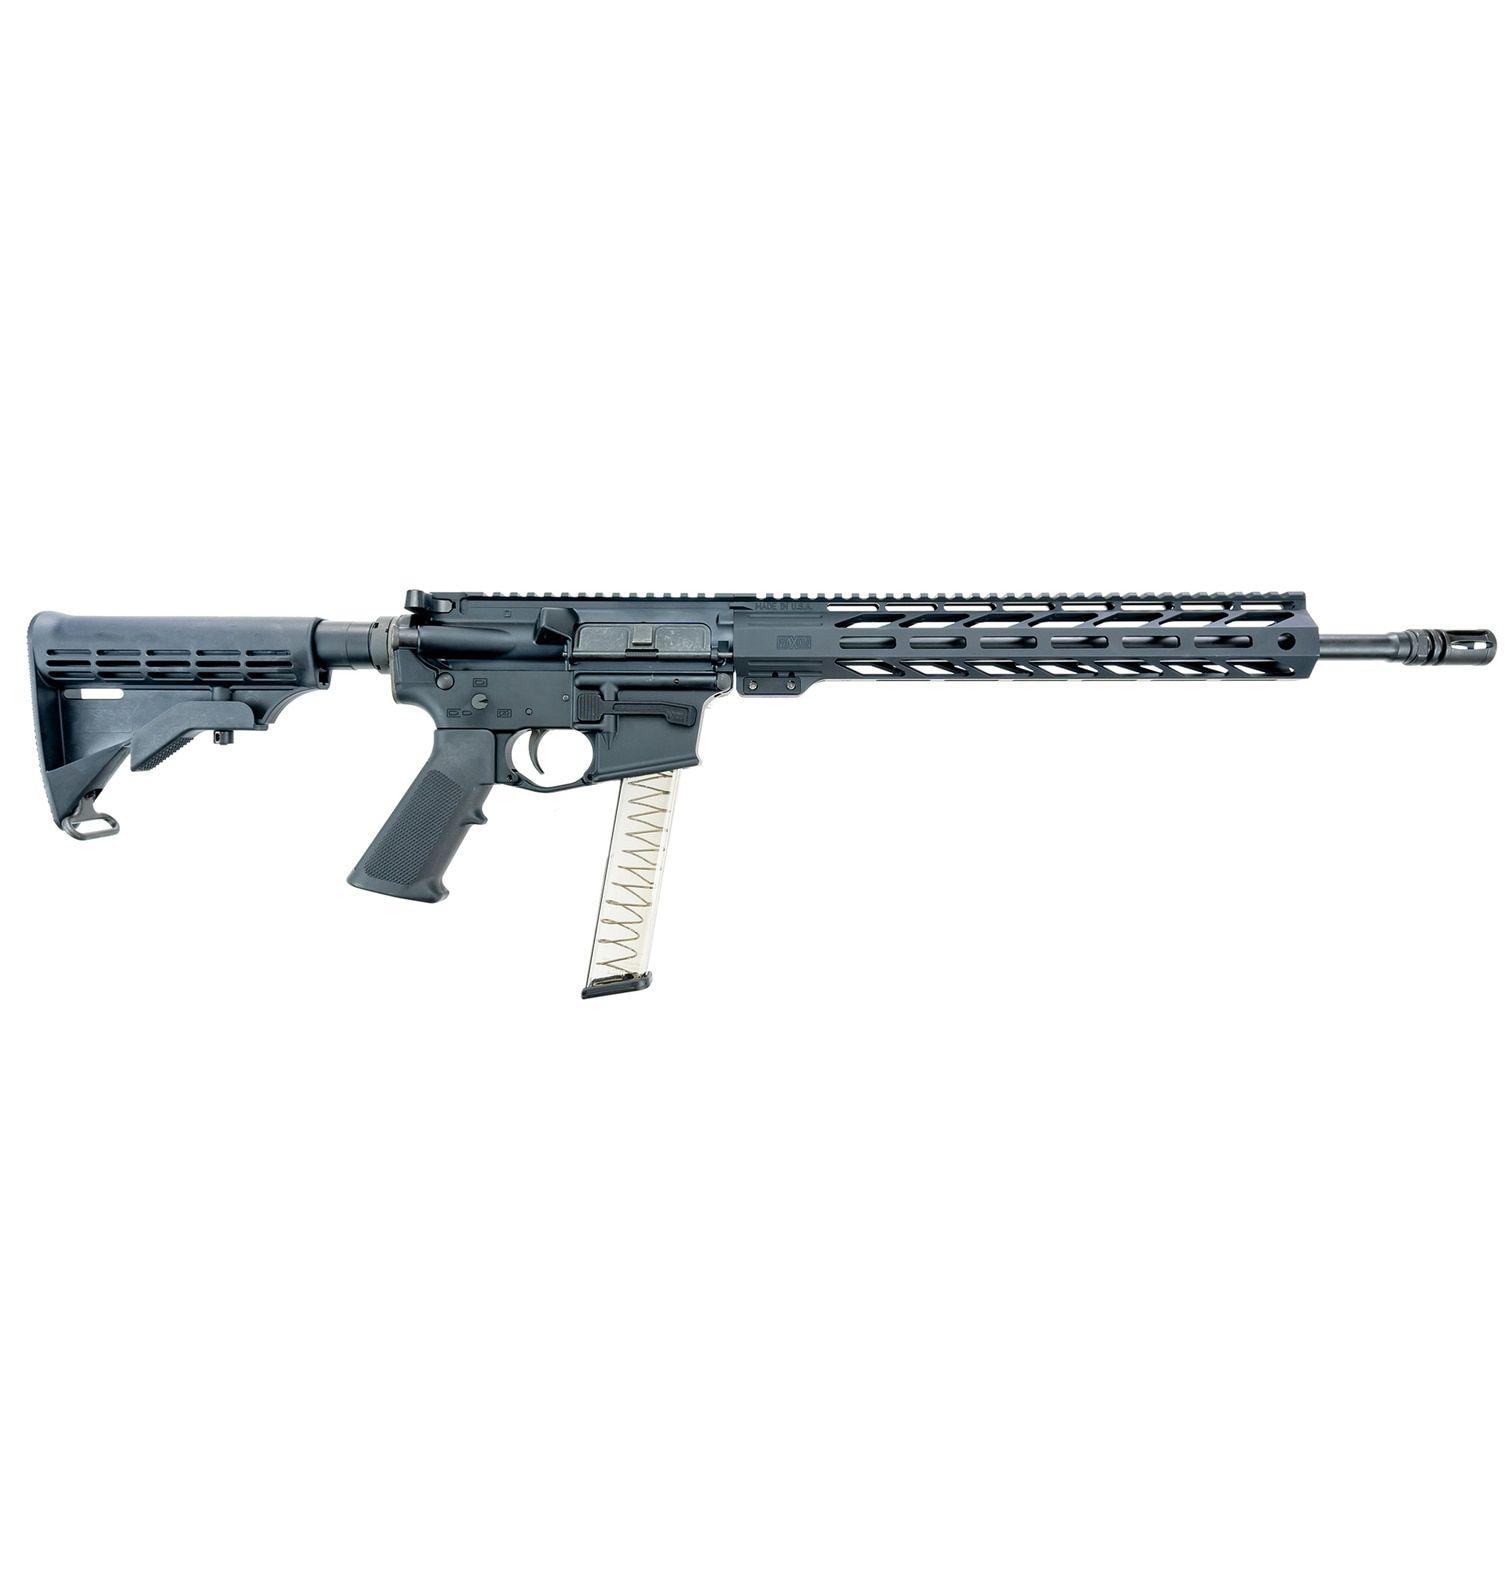 Faxon Bantam 16 - puška samonabíjecí, 9x19 mm